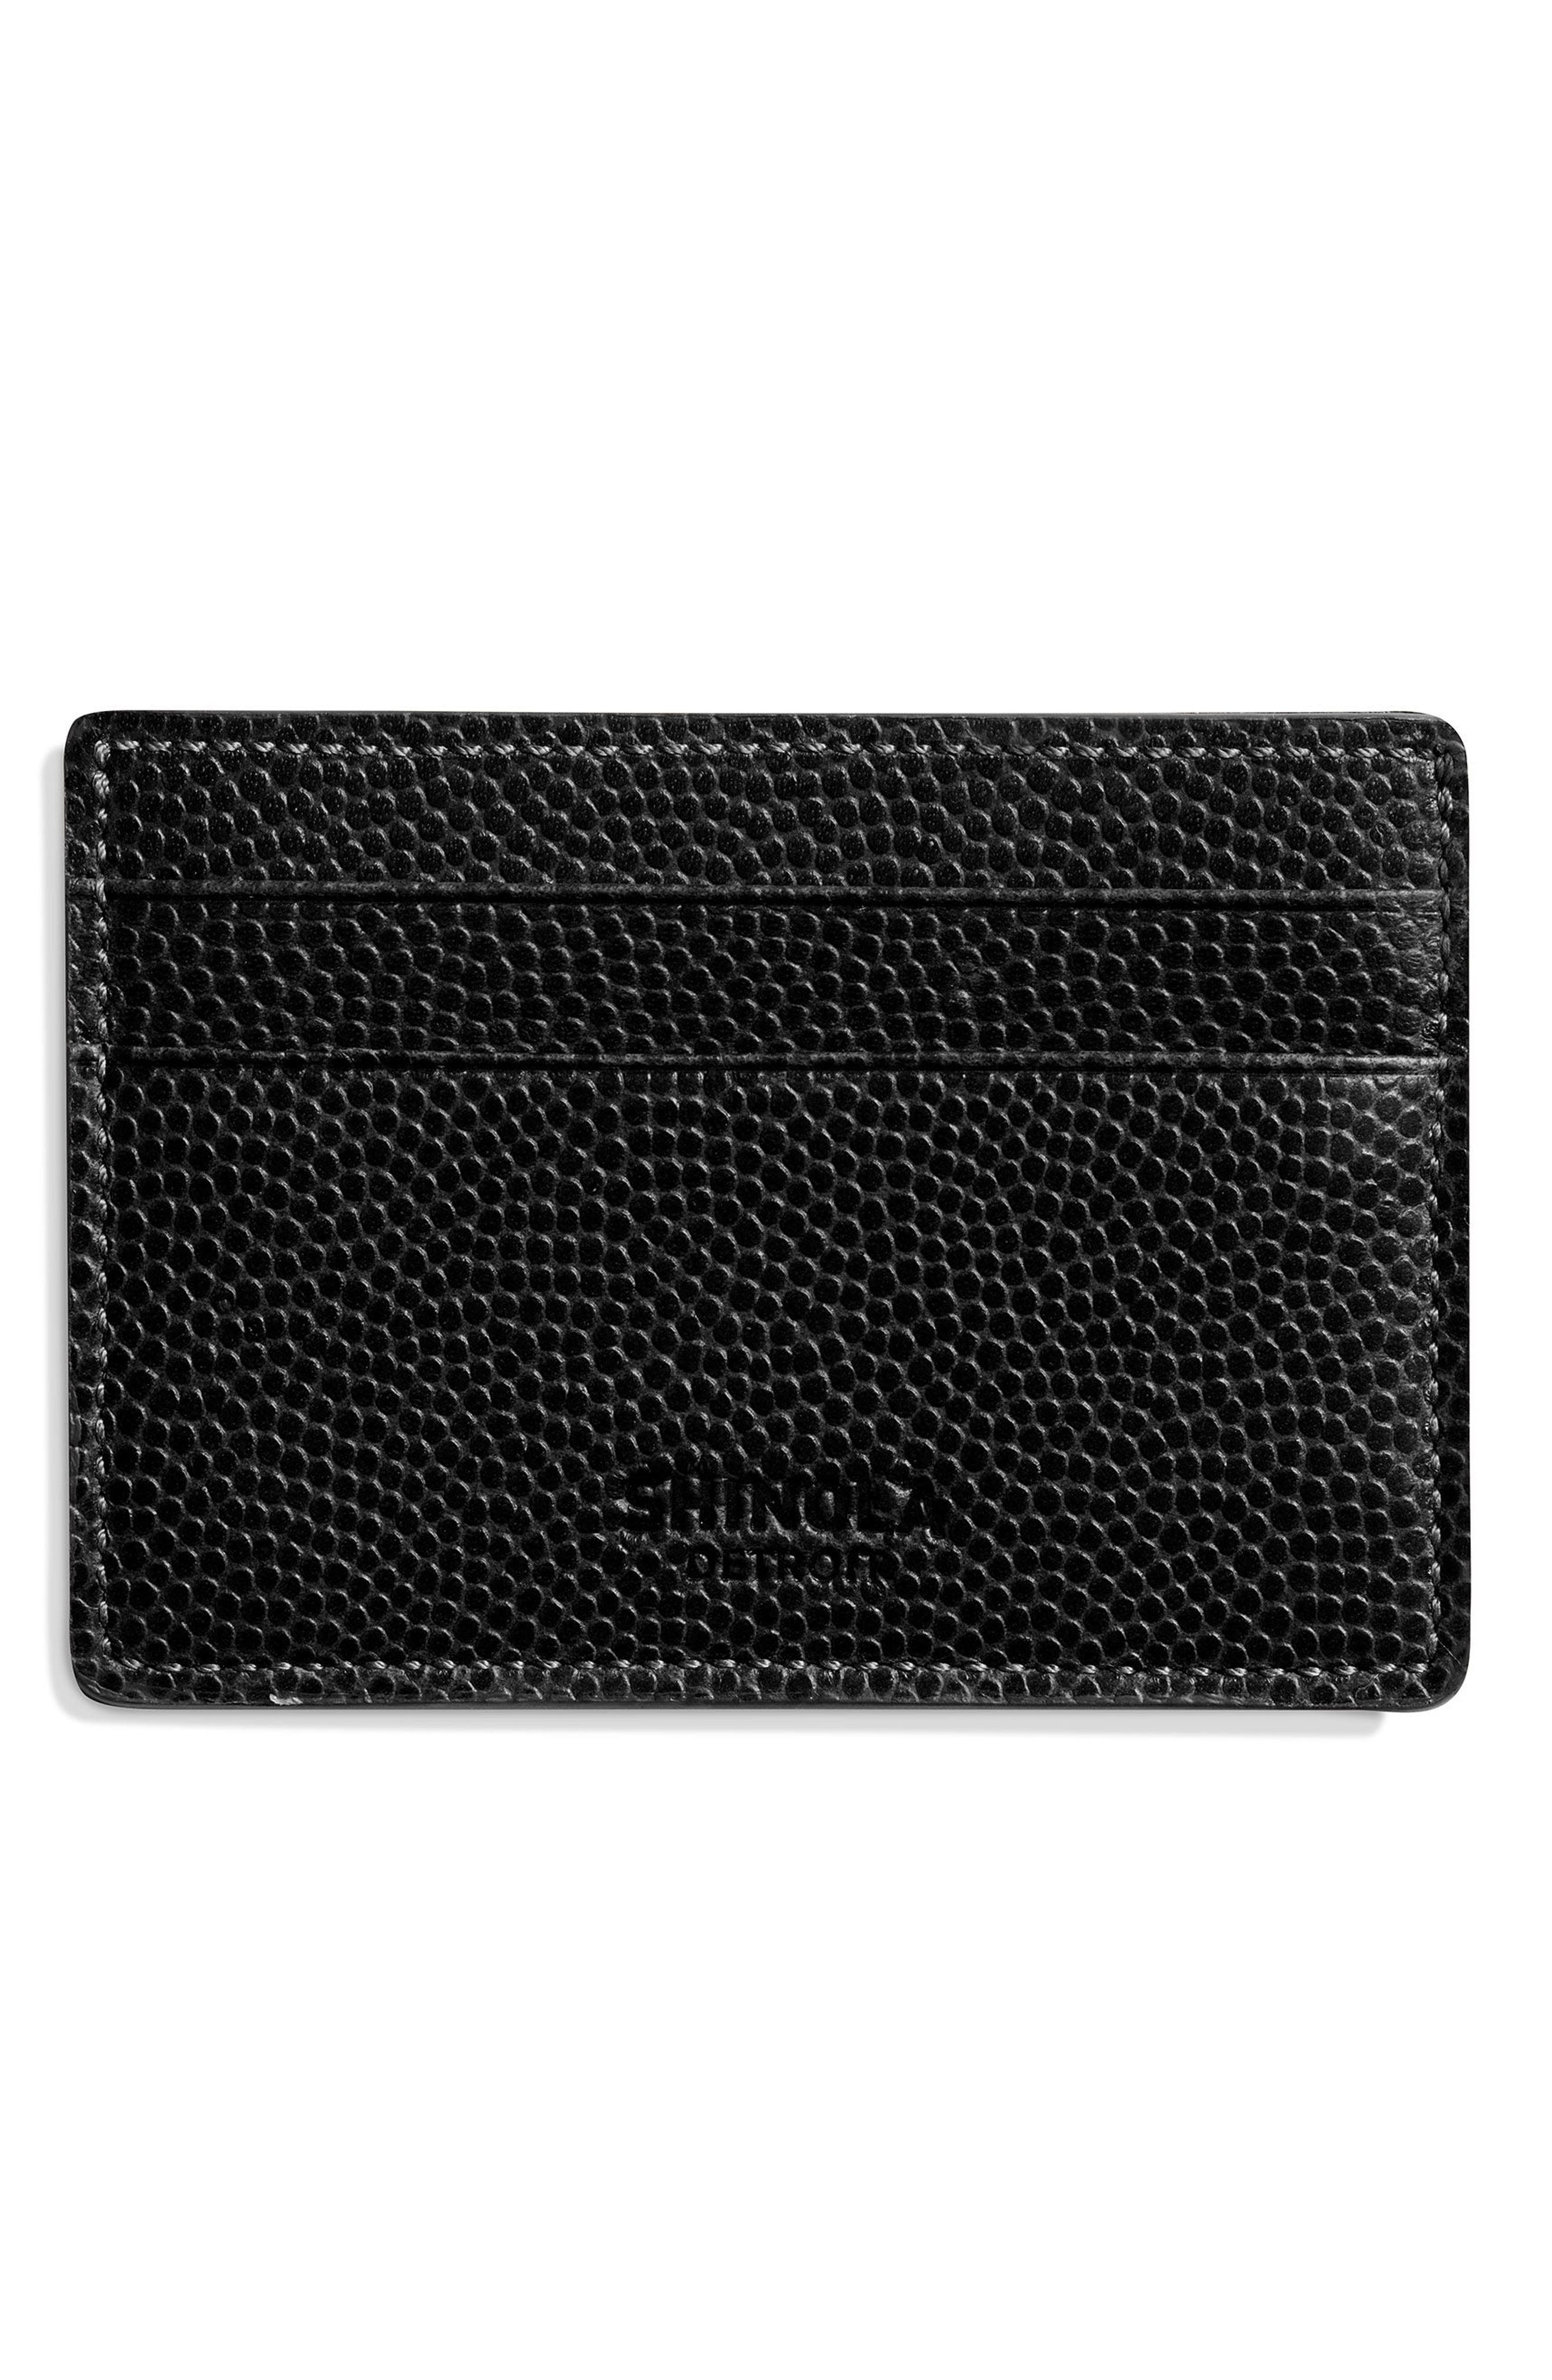 Latigo Leather Card Case,                             Alternate thumbnail 4, color,